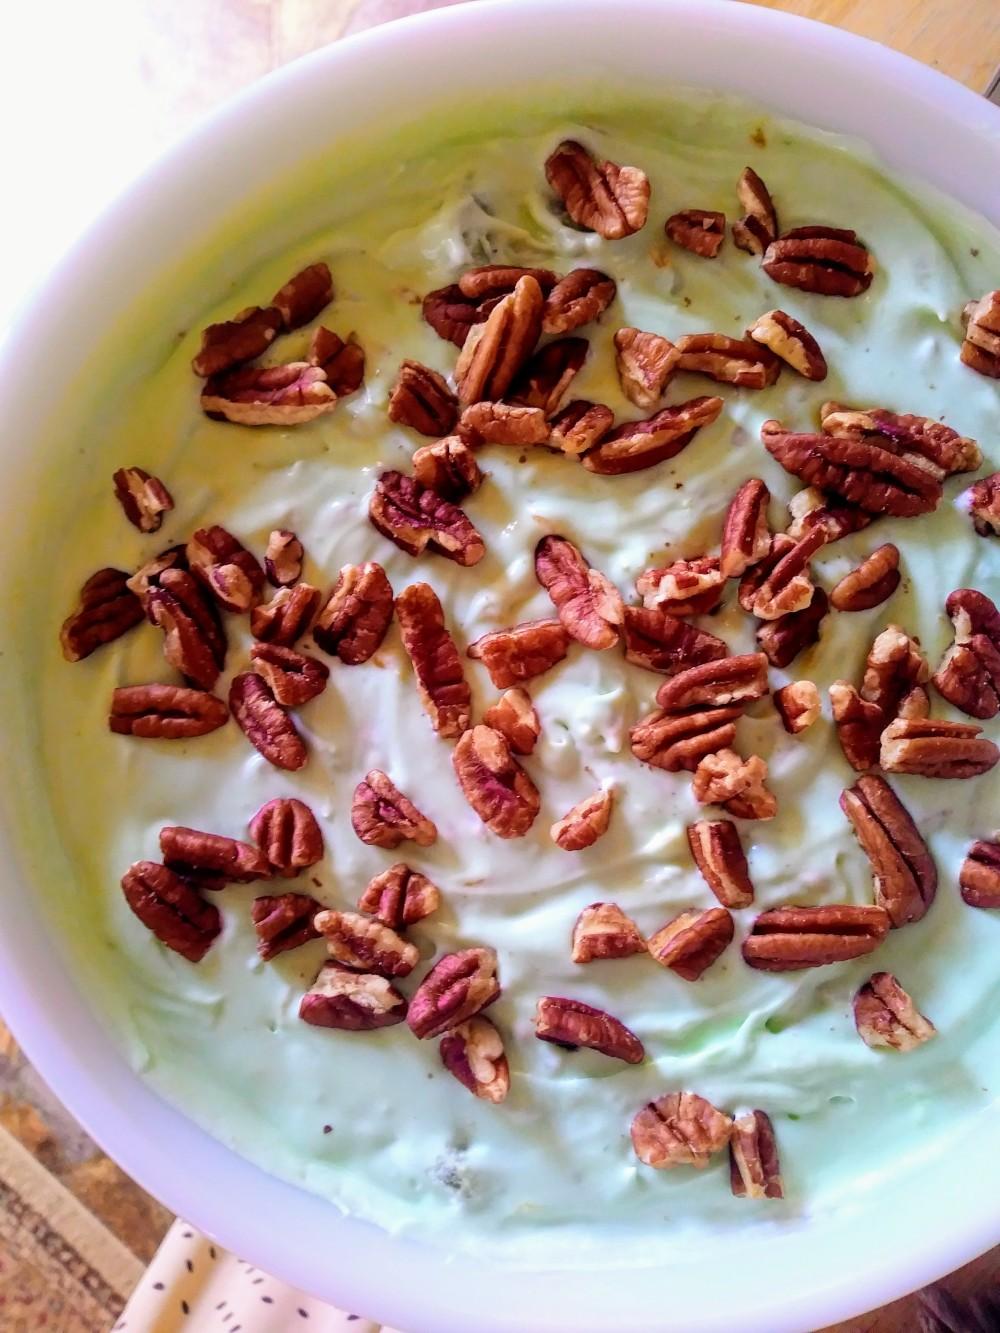 pistachio ambrosia